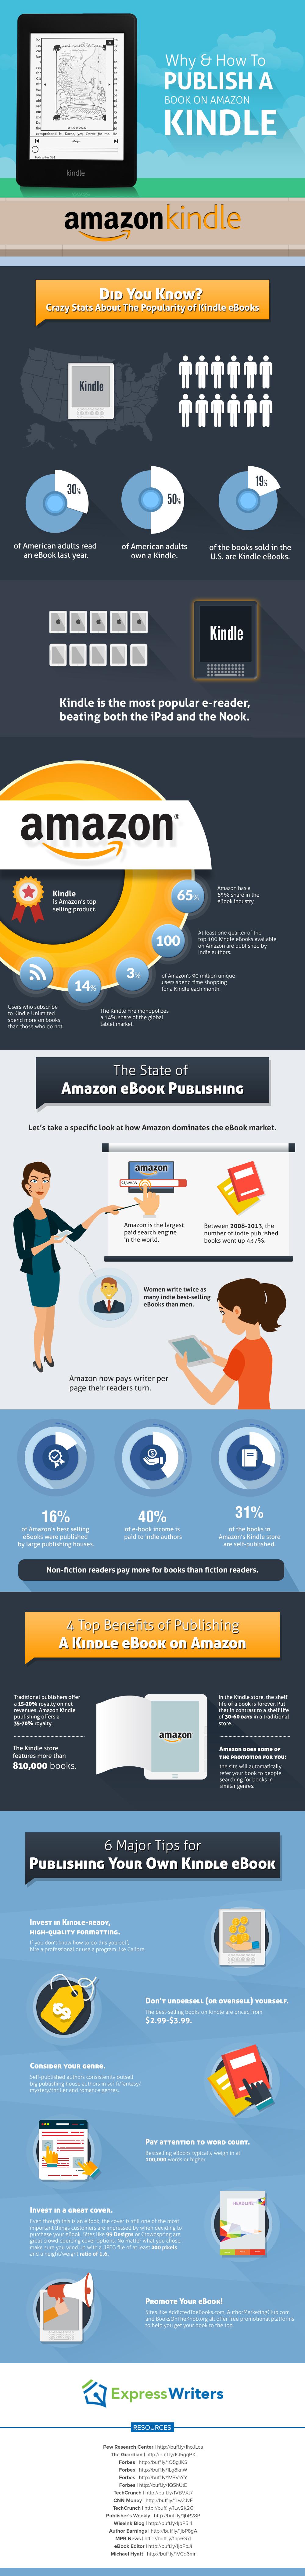 Publish on Amazon Kindle infographic